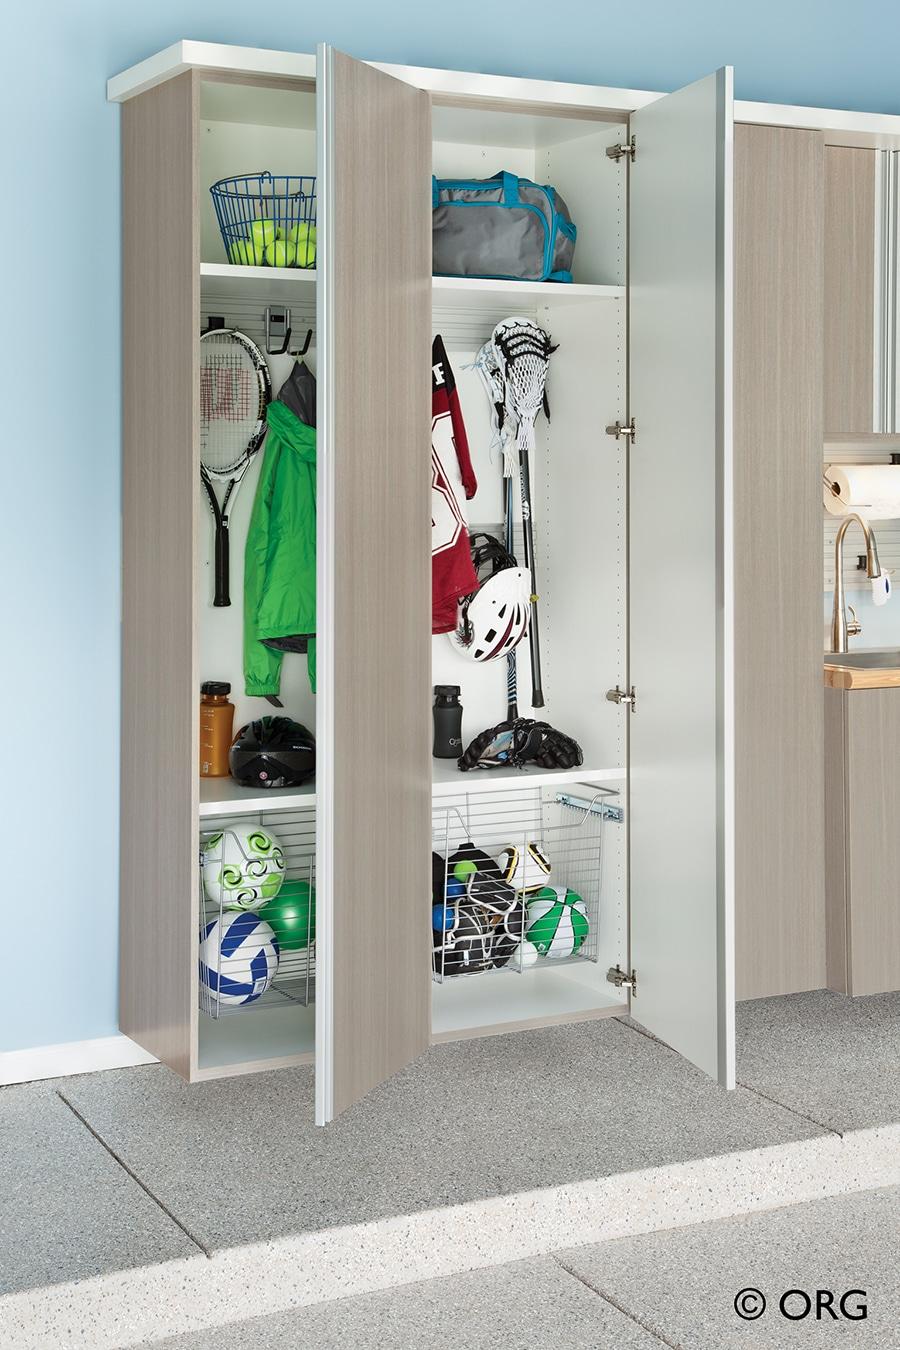 9 hang tools sporting equipment inside garage cabinets columbus ohio | Innovate Home Org | #Hangtools #garagecabinets #SportingEquipment